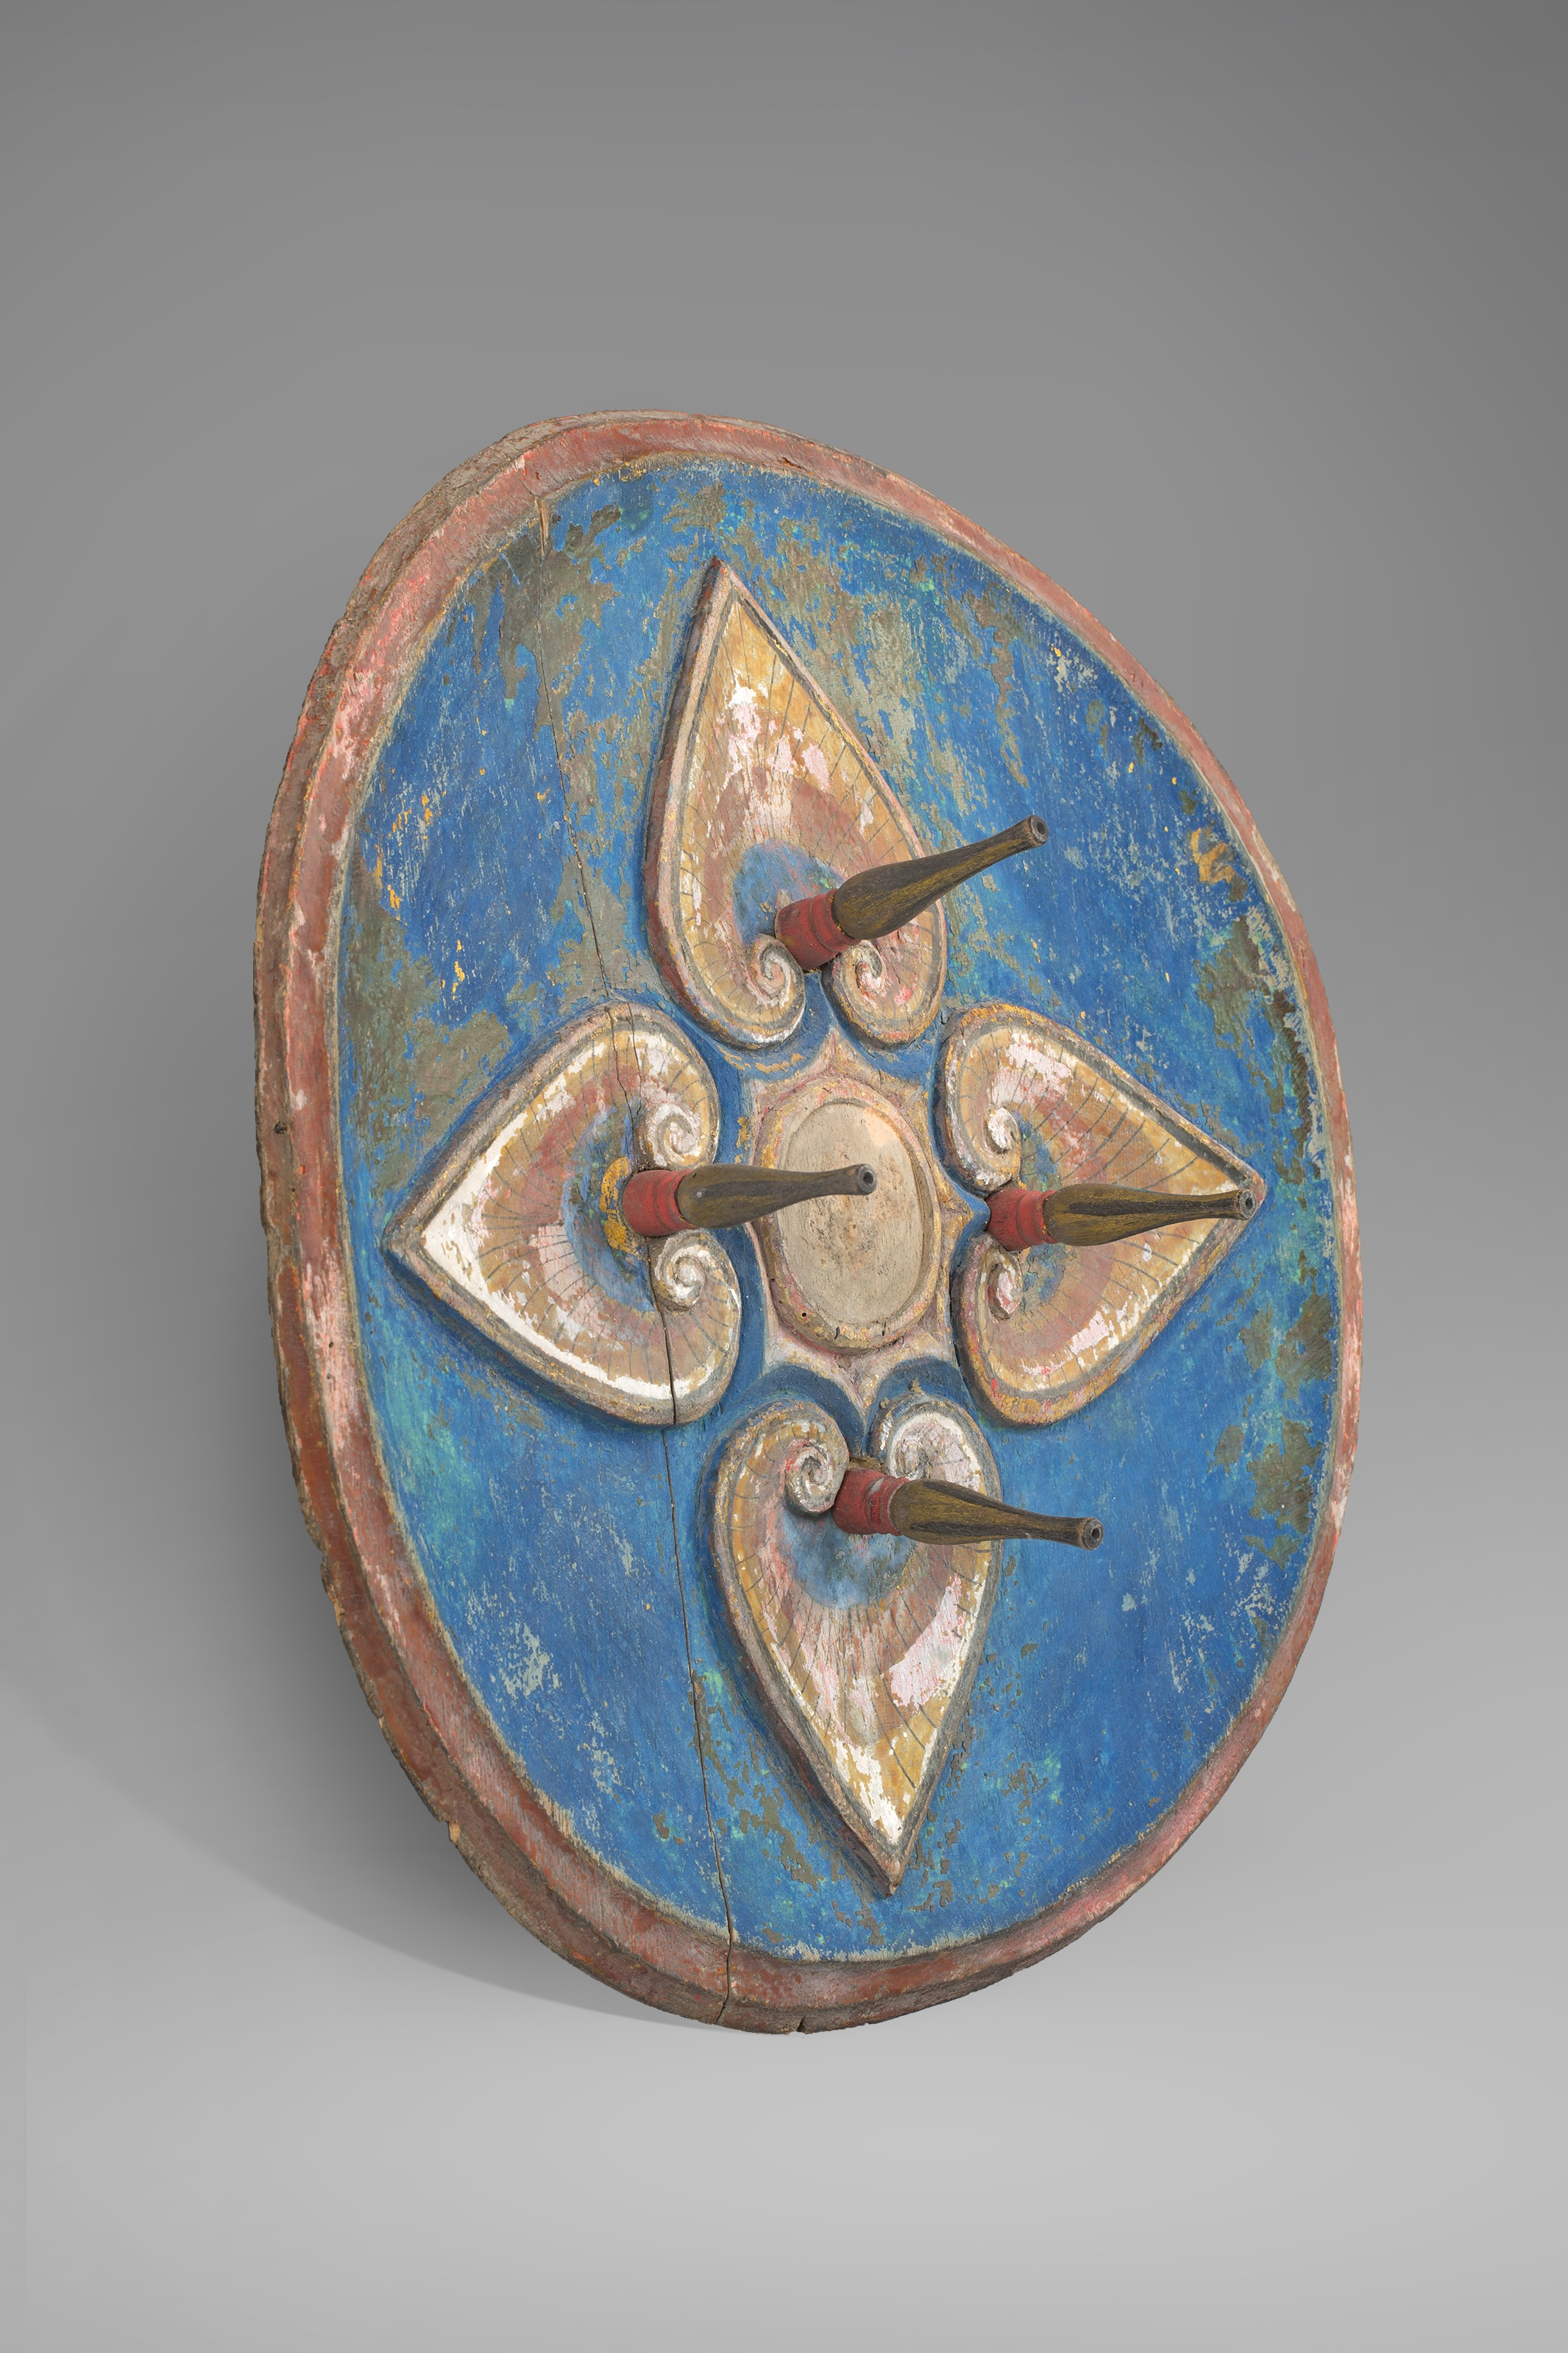 Bali, ceremonial shield, ca 1930. Image courtesy of Bill Evans